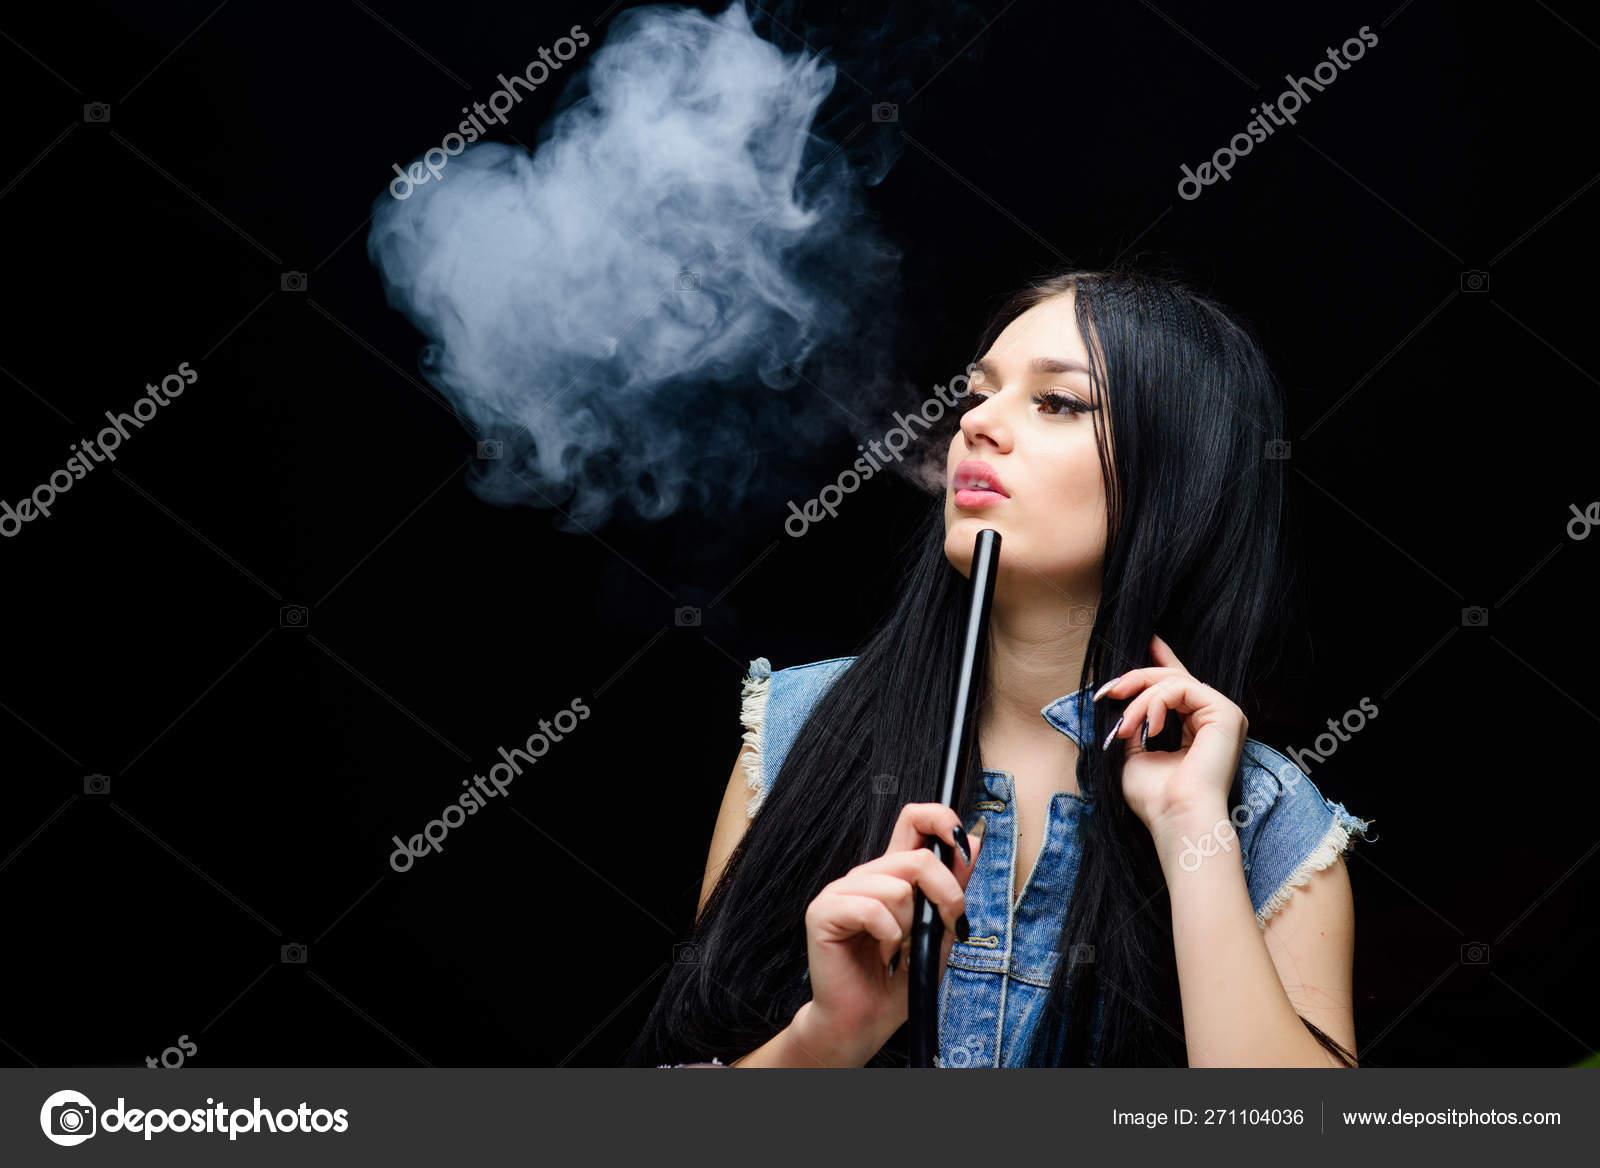 Bad habit  Woman vapor  exhale smoke on black background